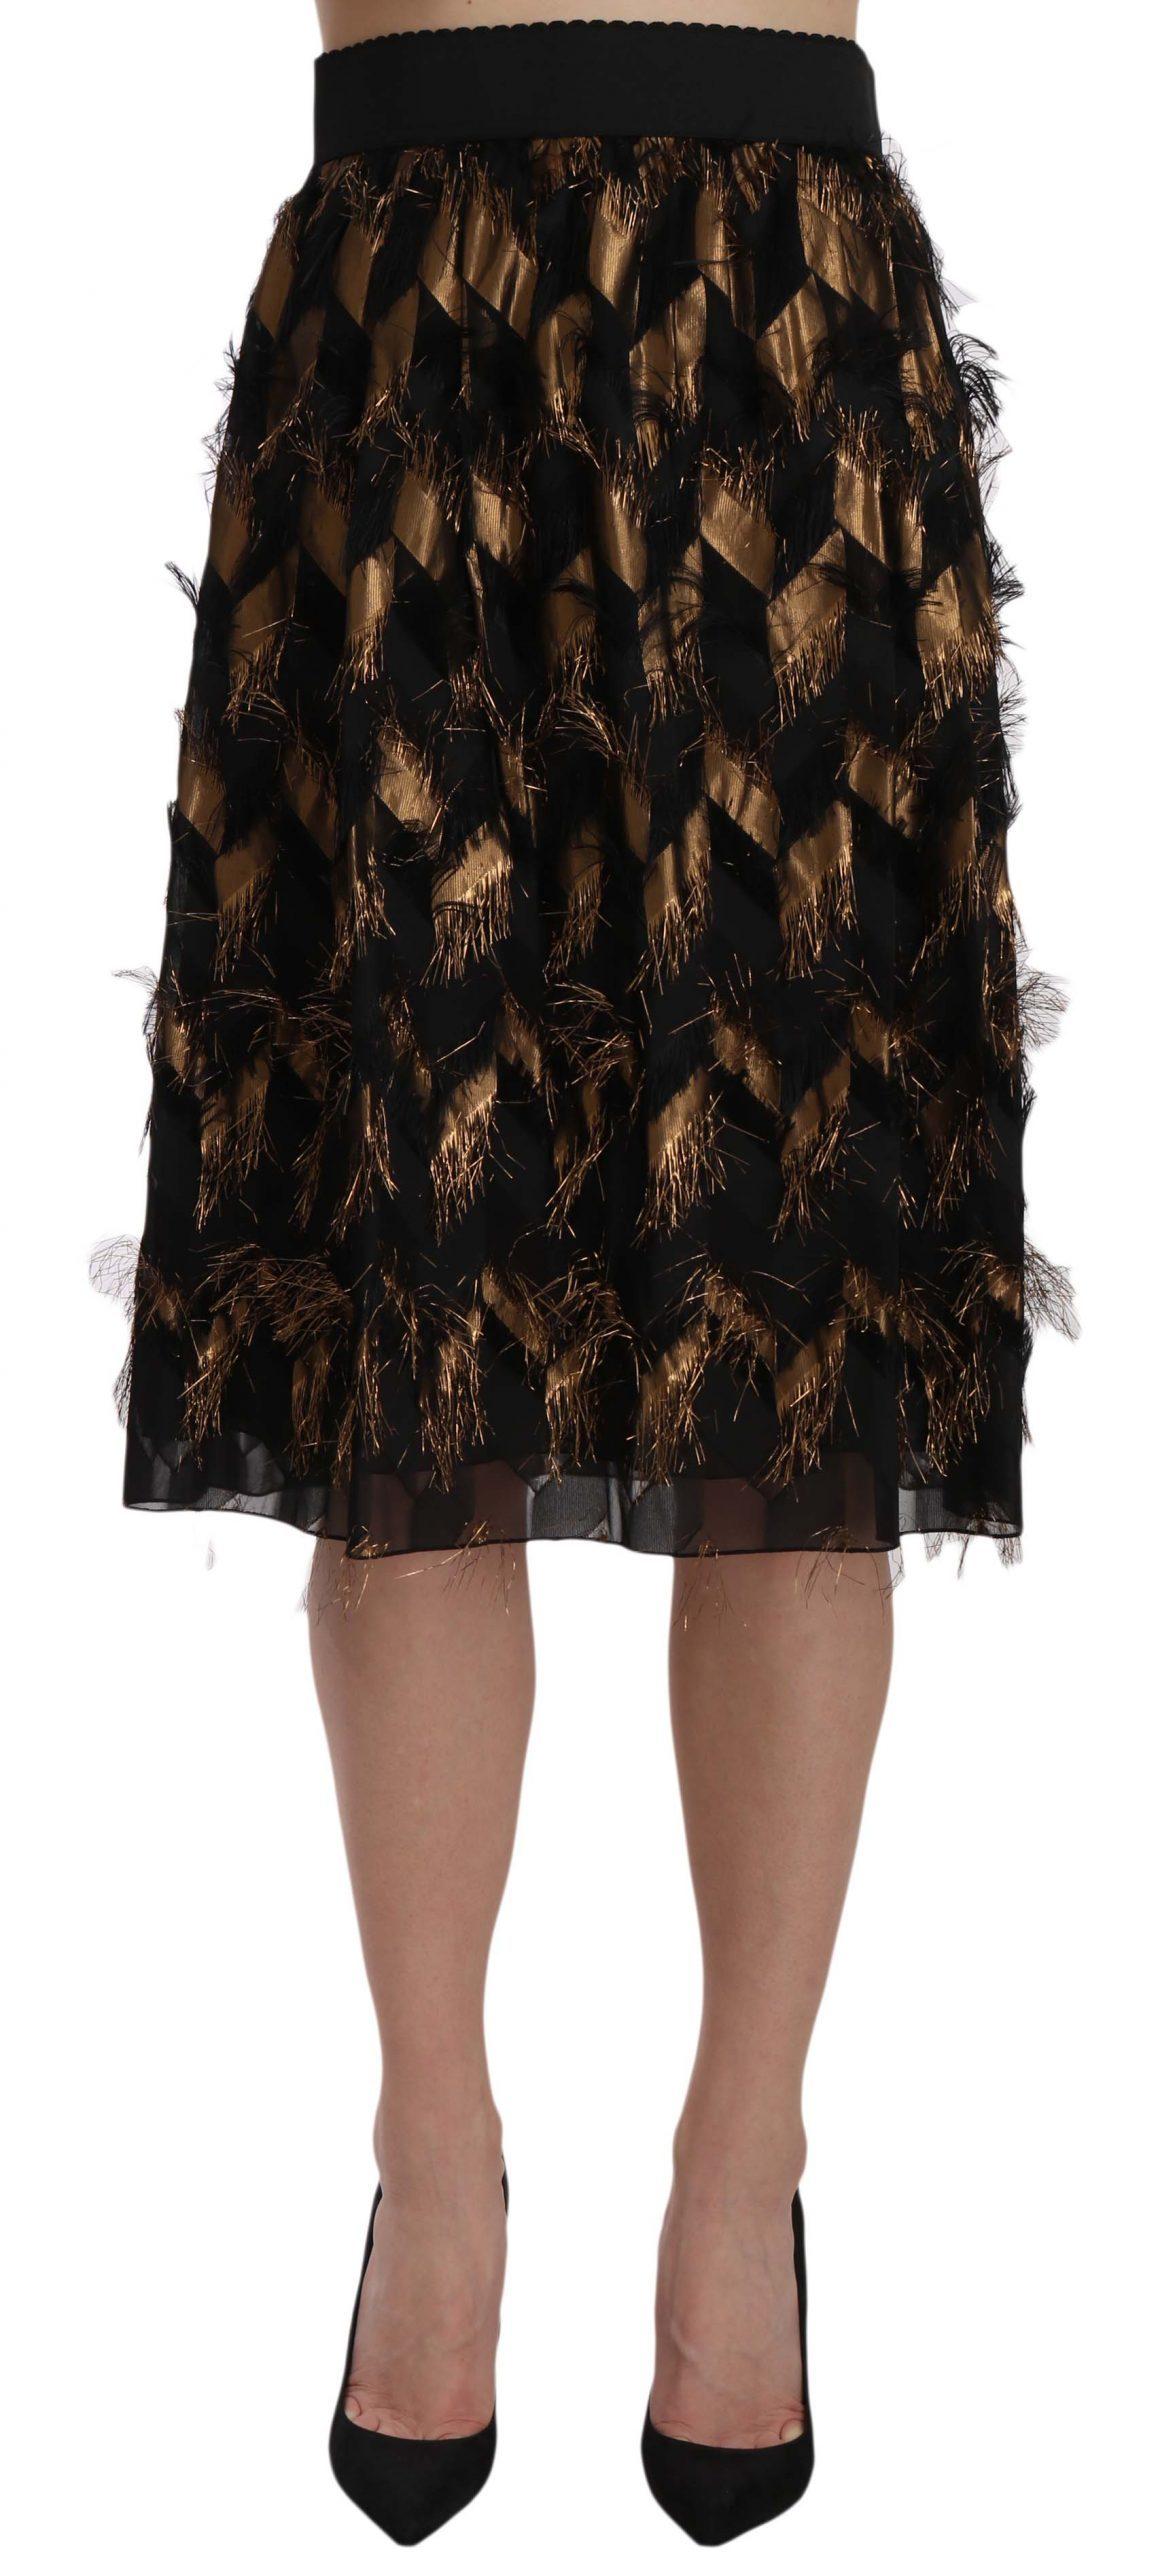 Dolce & Gabbana Women's Fringe Metallic Pencil A-line Skirt Gold Black SKI1177 - IT38|XS